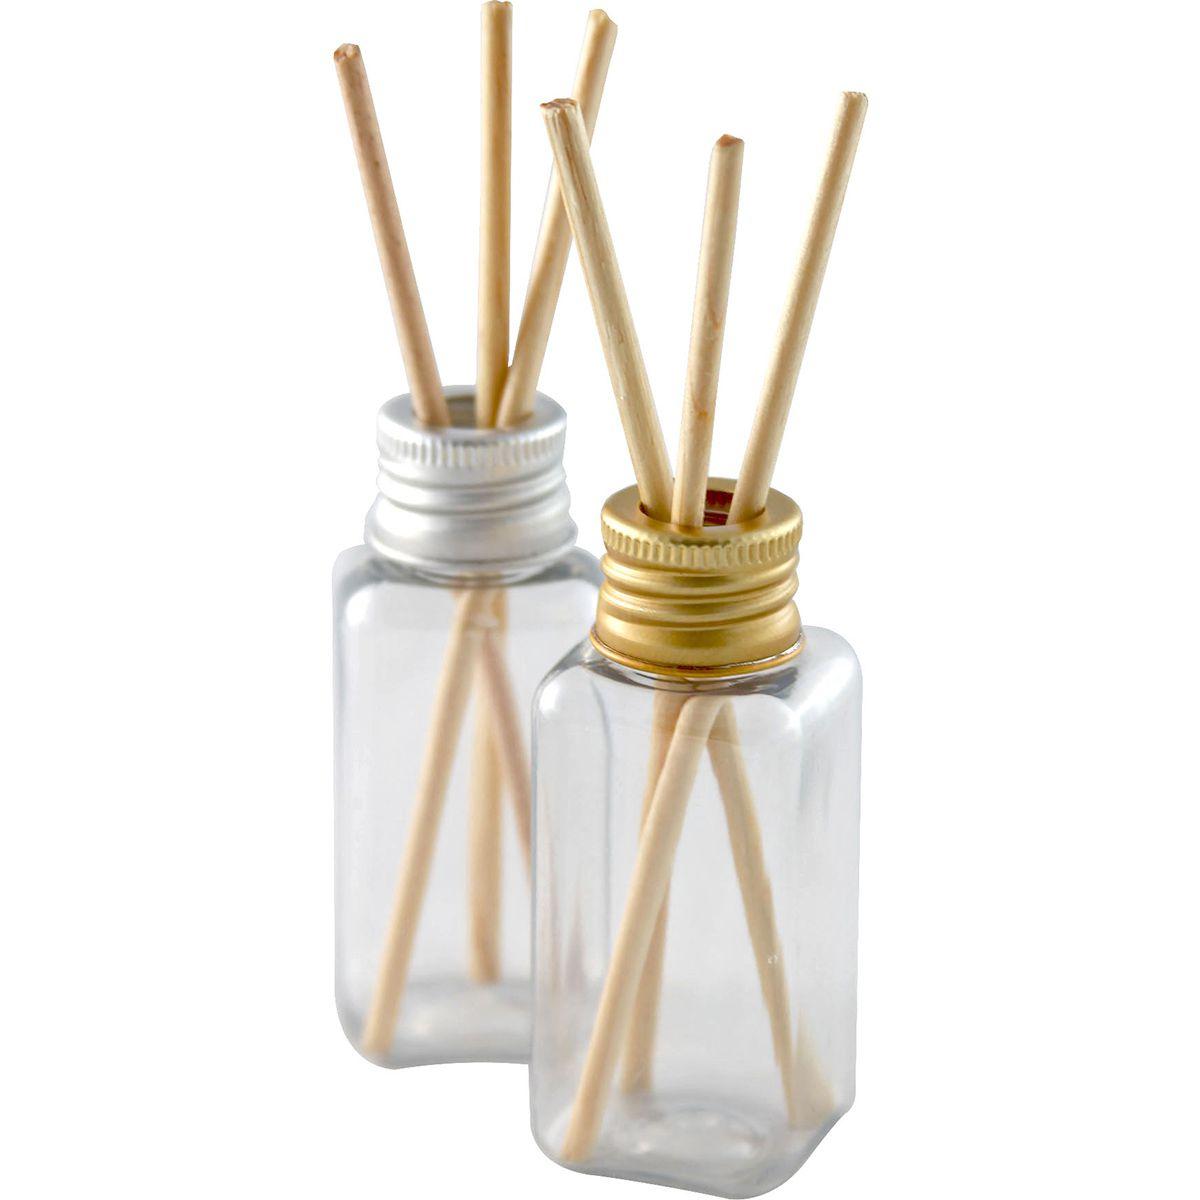 Frasco para Aromatizador Atacado Plástico de 40 ml kit com 150 unidades